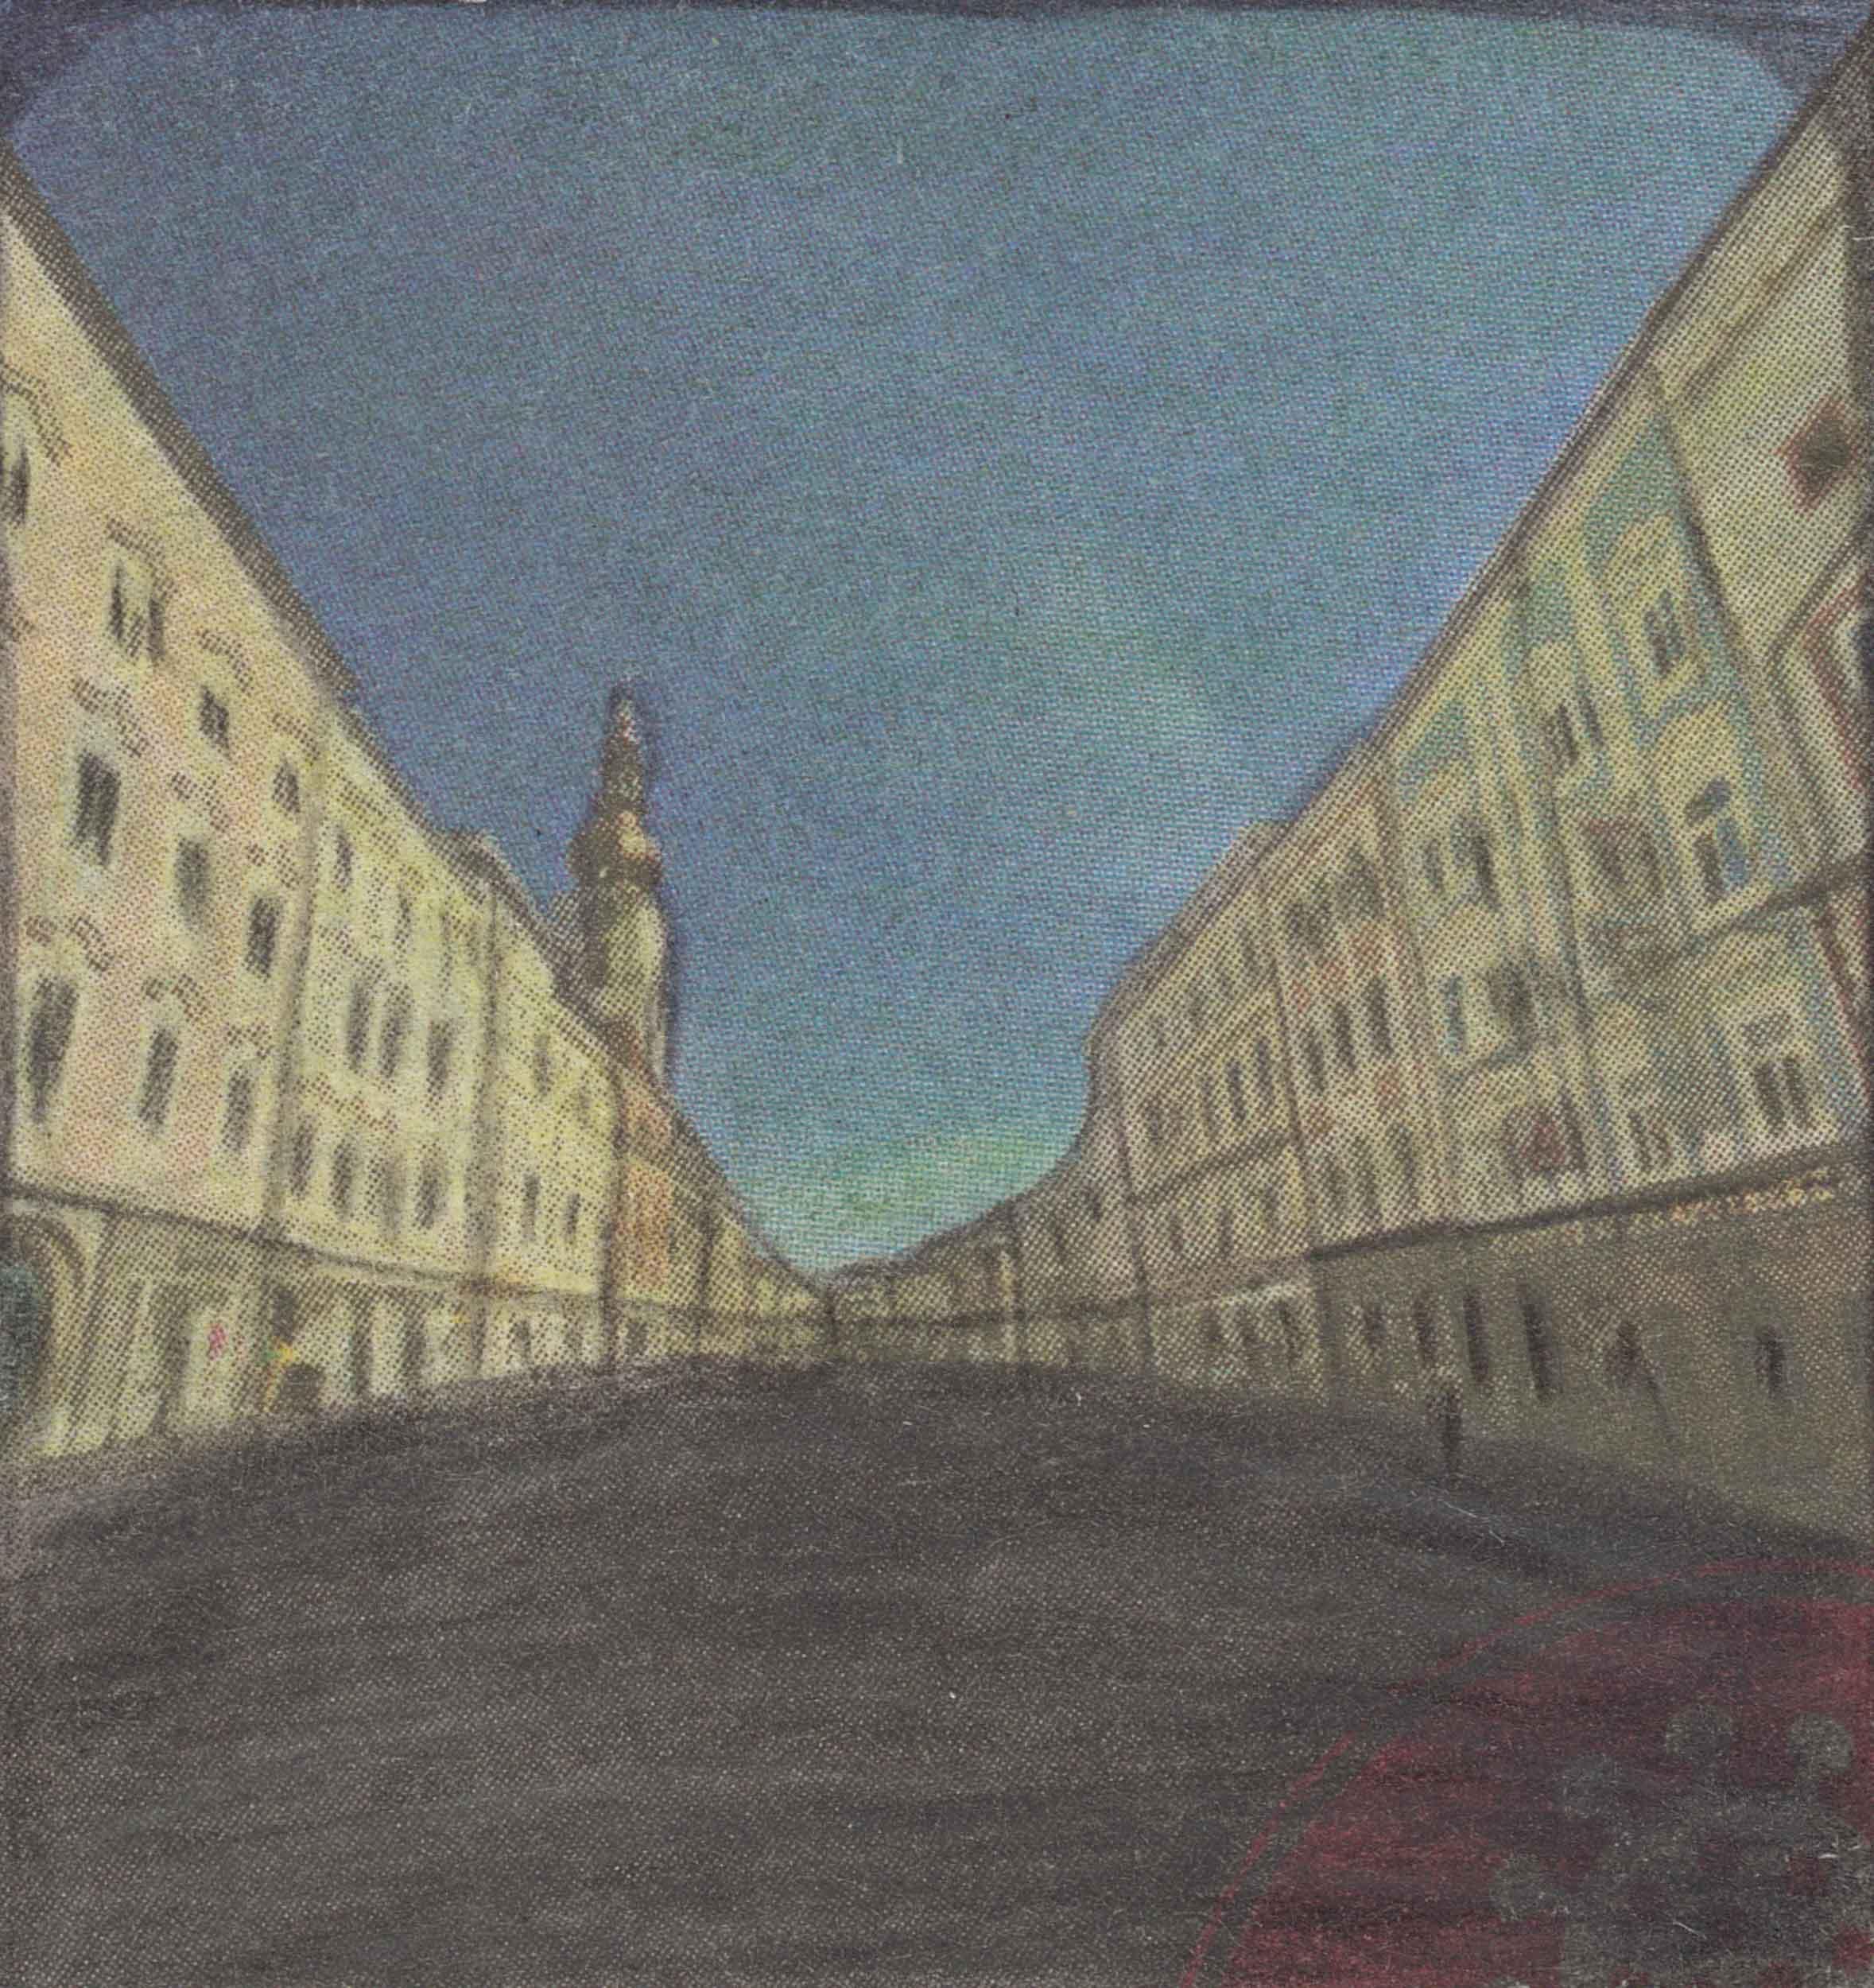 strobl leopold - Ohne Titel / Untitled